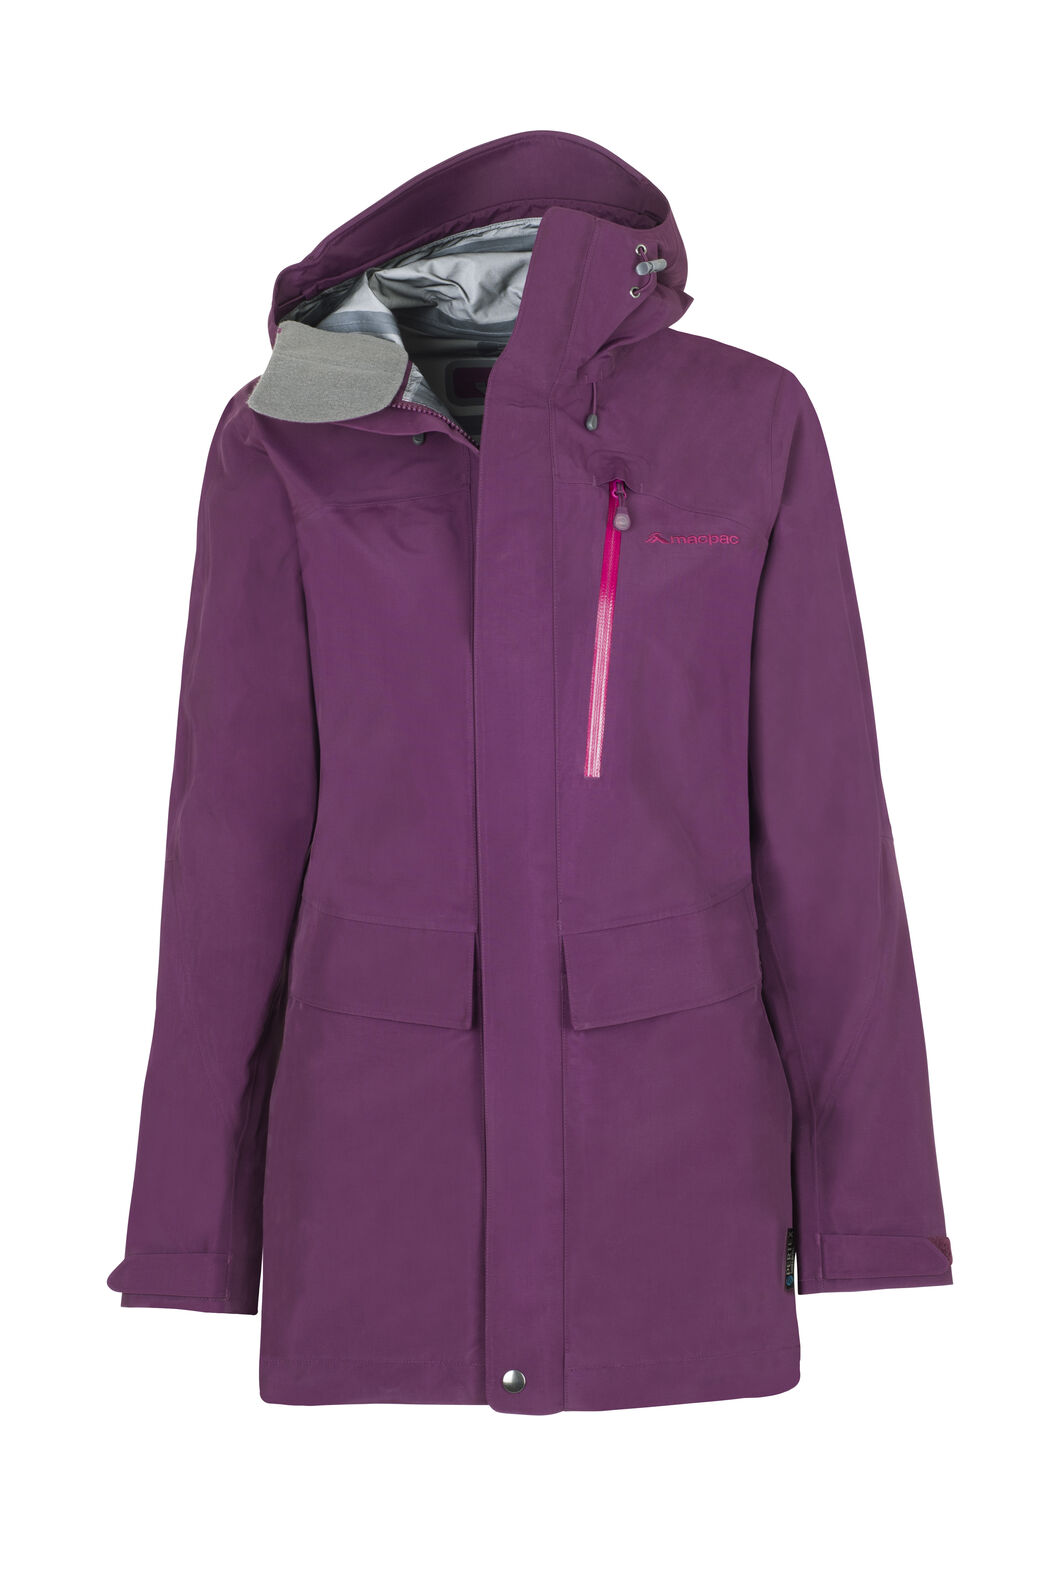 Macpac Resolution Pertex® Rain Jacket - Women's, Potent Purple, hi-res